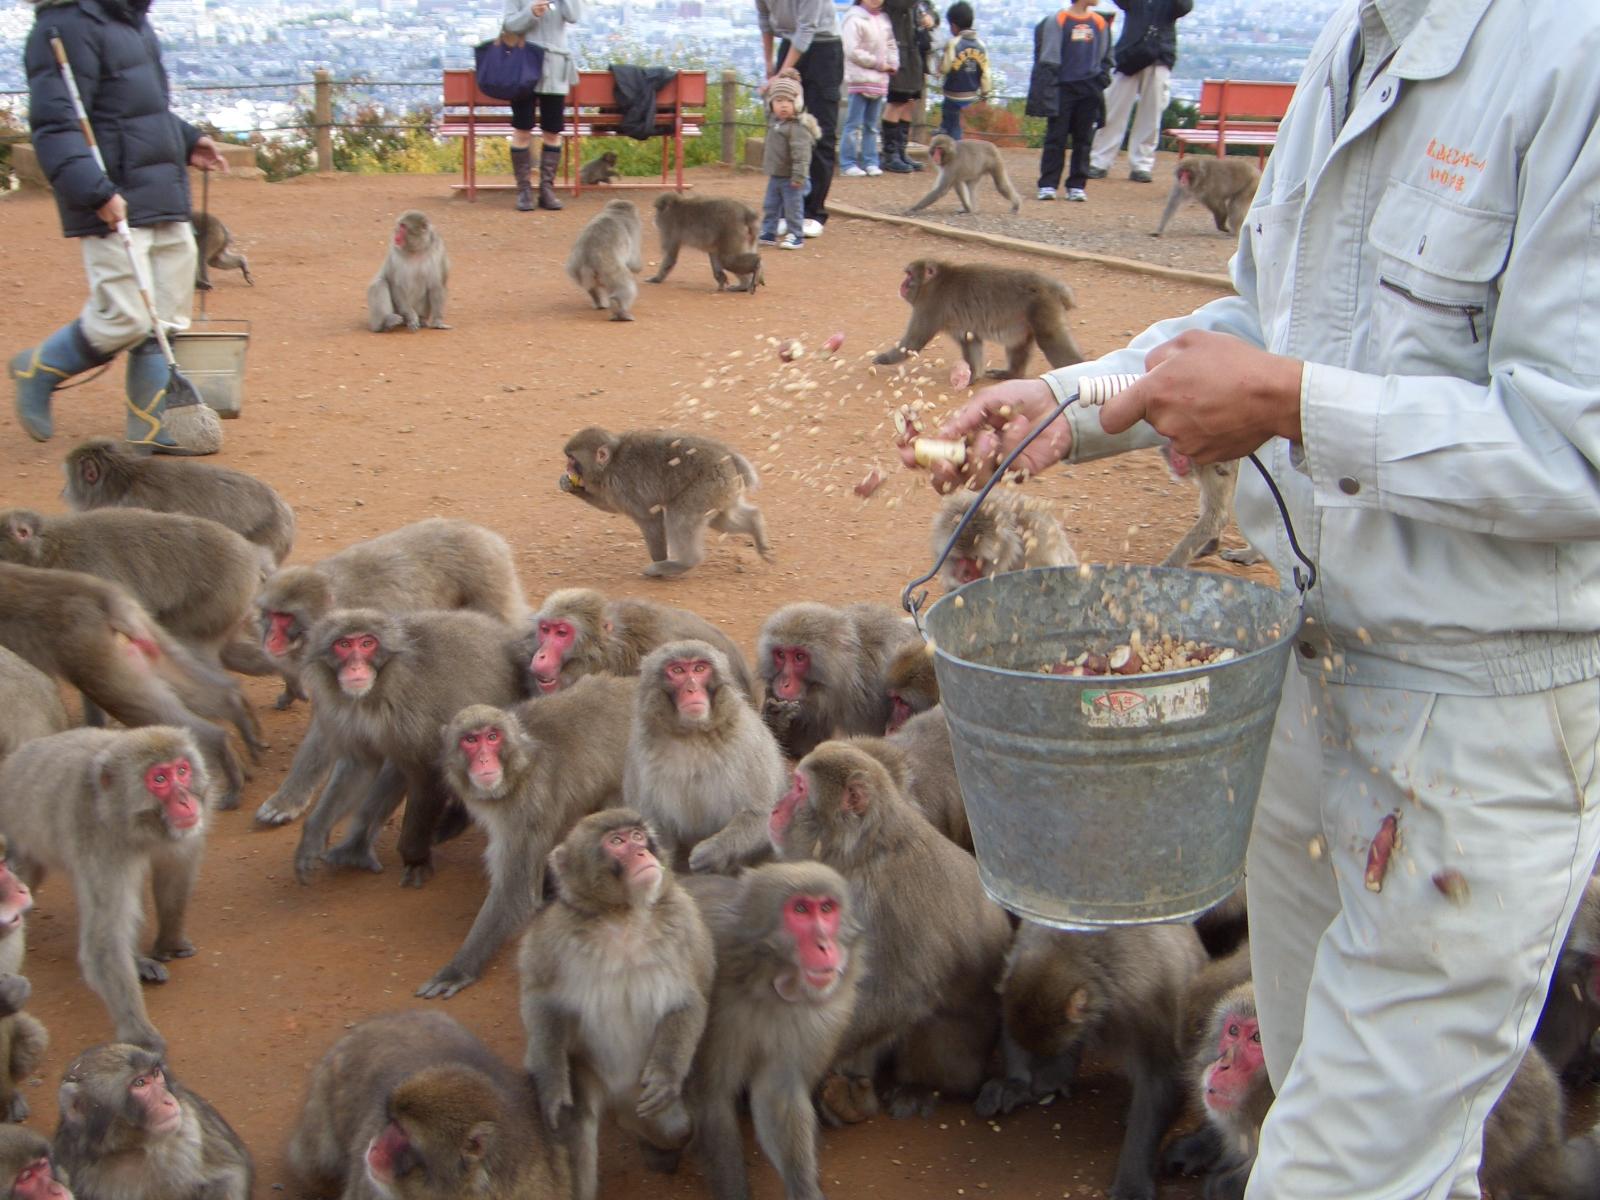 File:Macaca fuscata, feeding time, iwatayama, 20081122.jpg